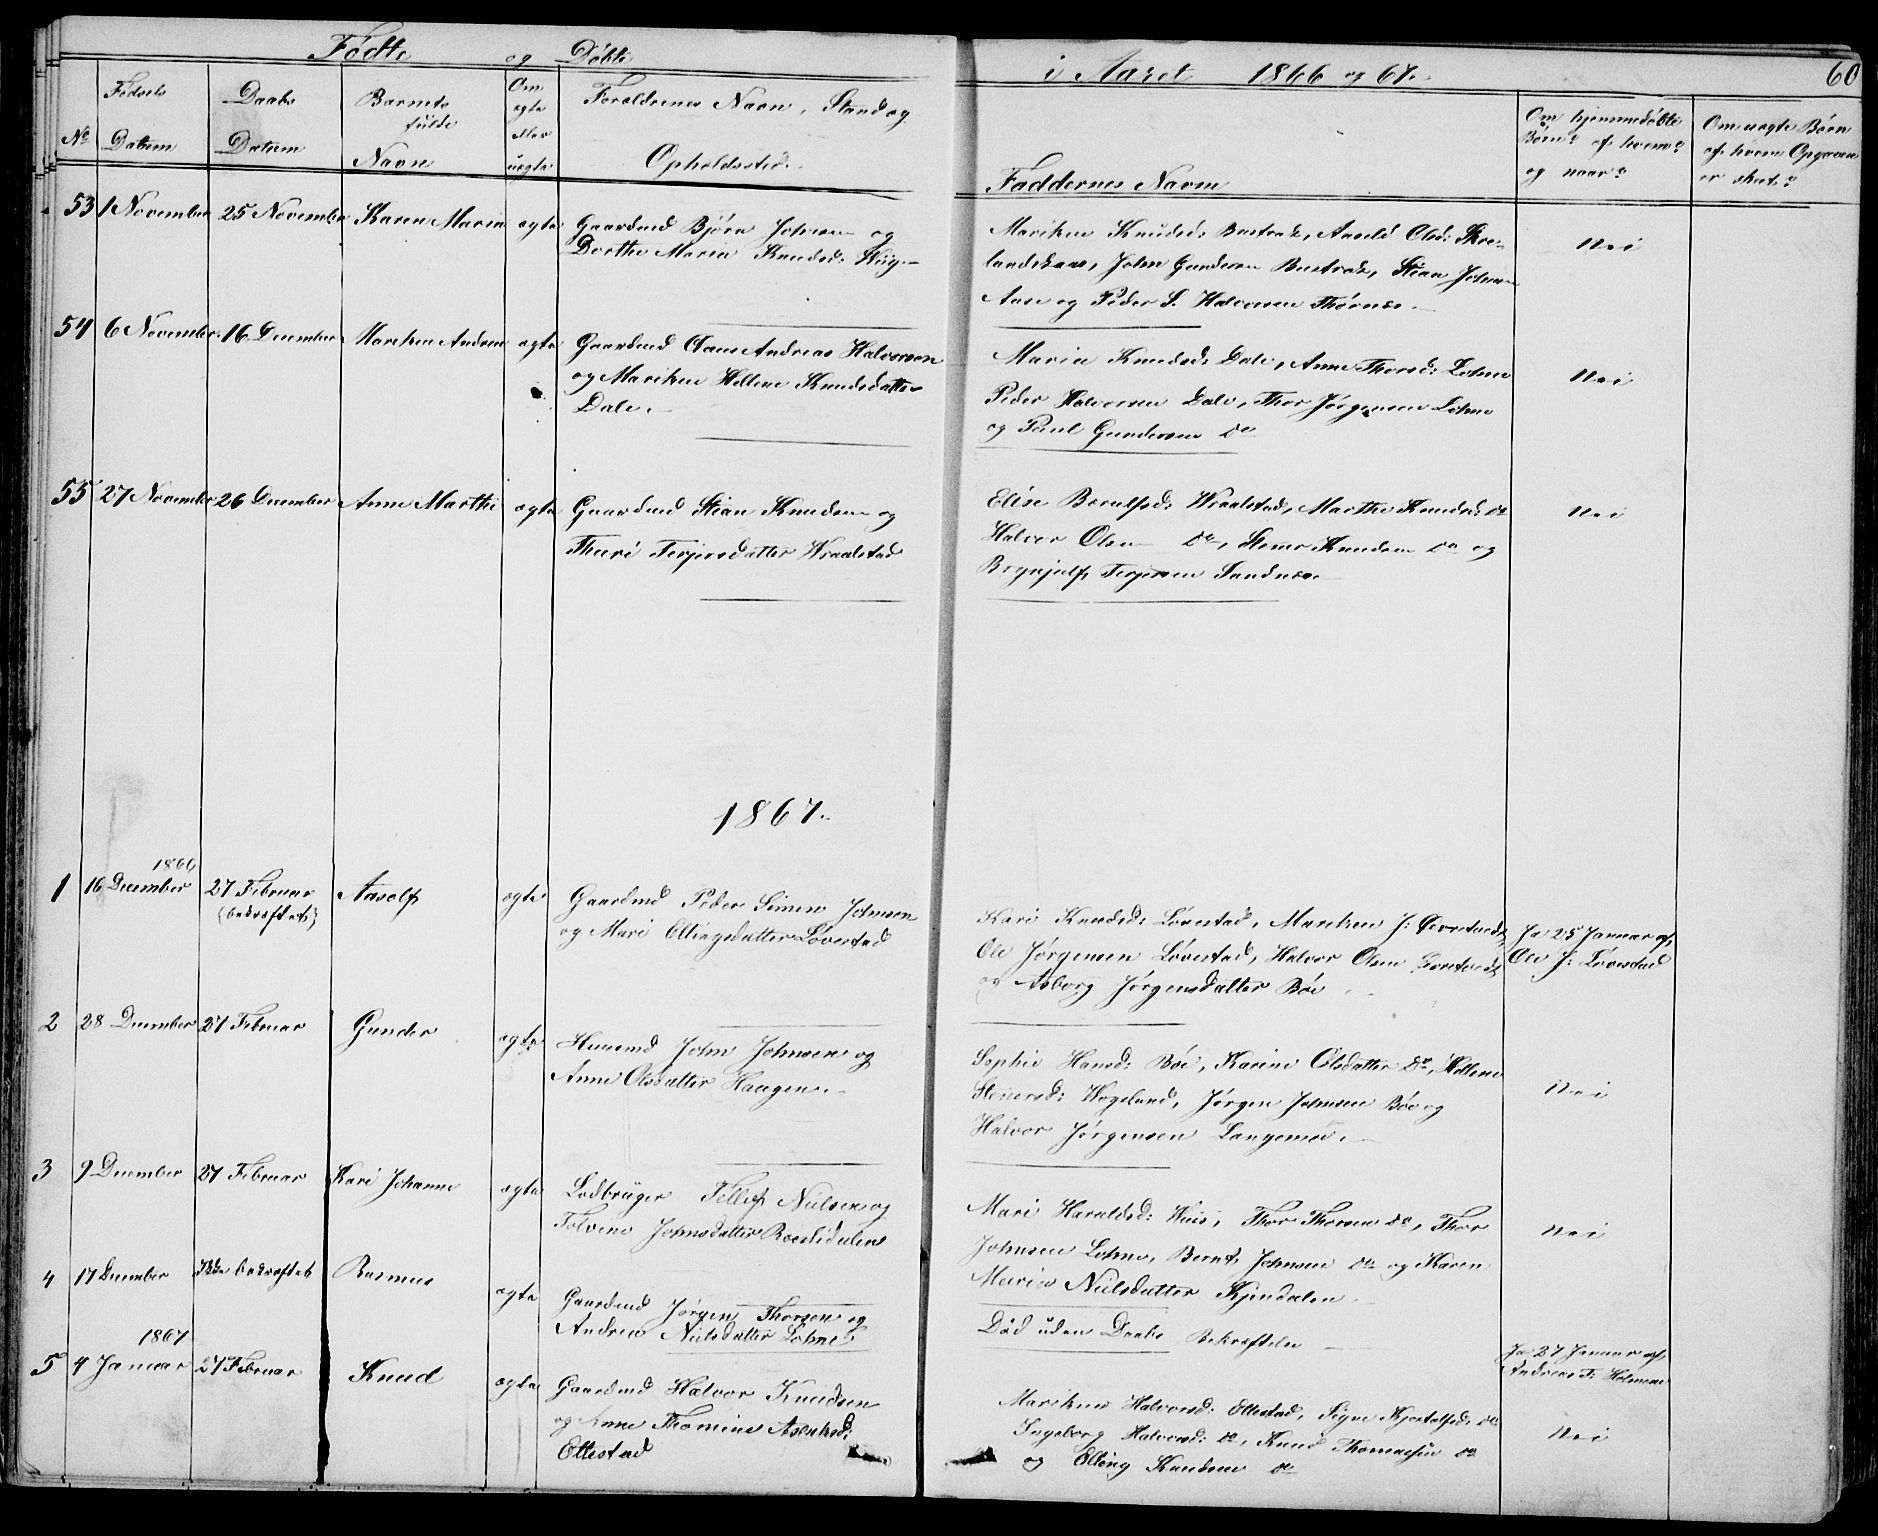 SAKO, Drangedal kirkebøker, G/Gb/L0001: Klokkerbok nr. II 1, 1856-1894, s. 60